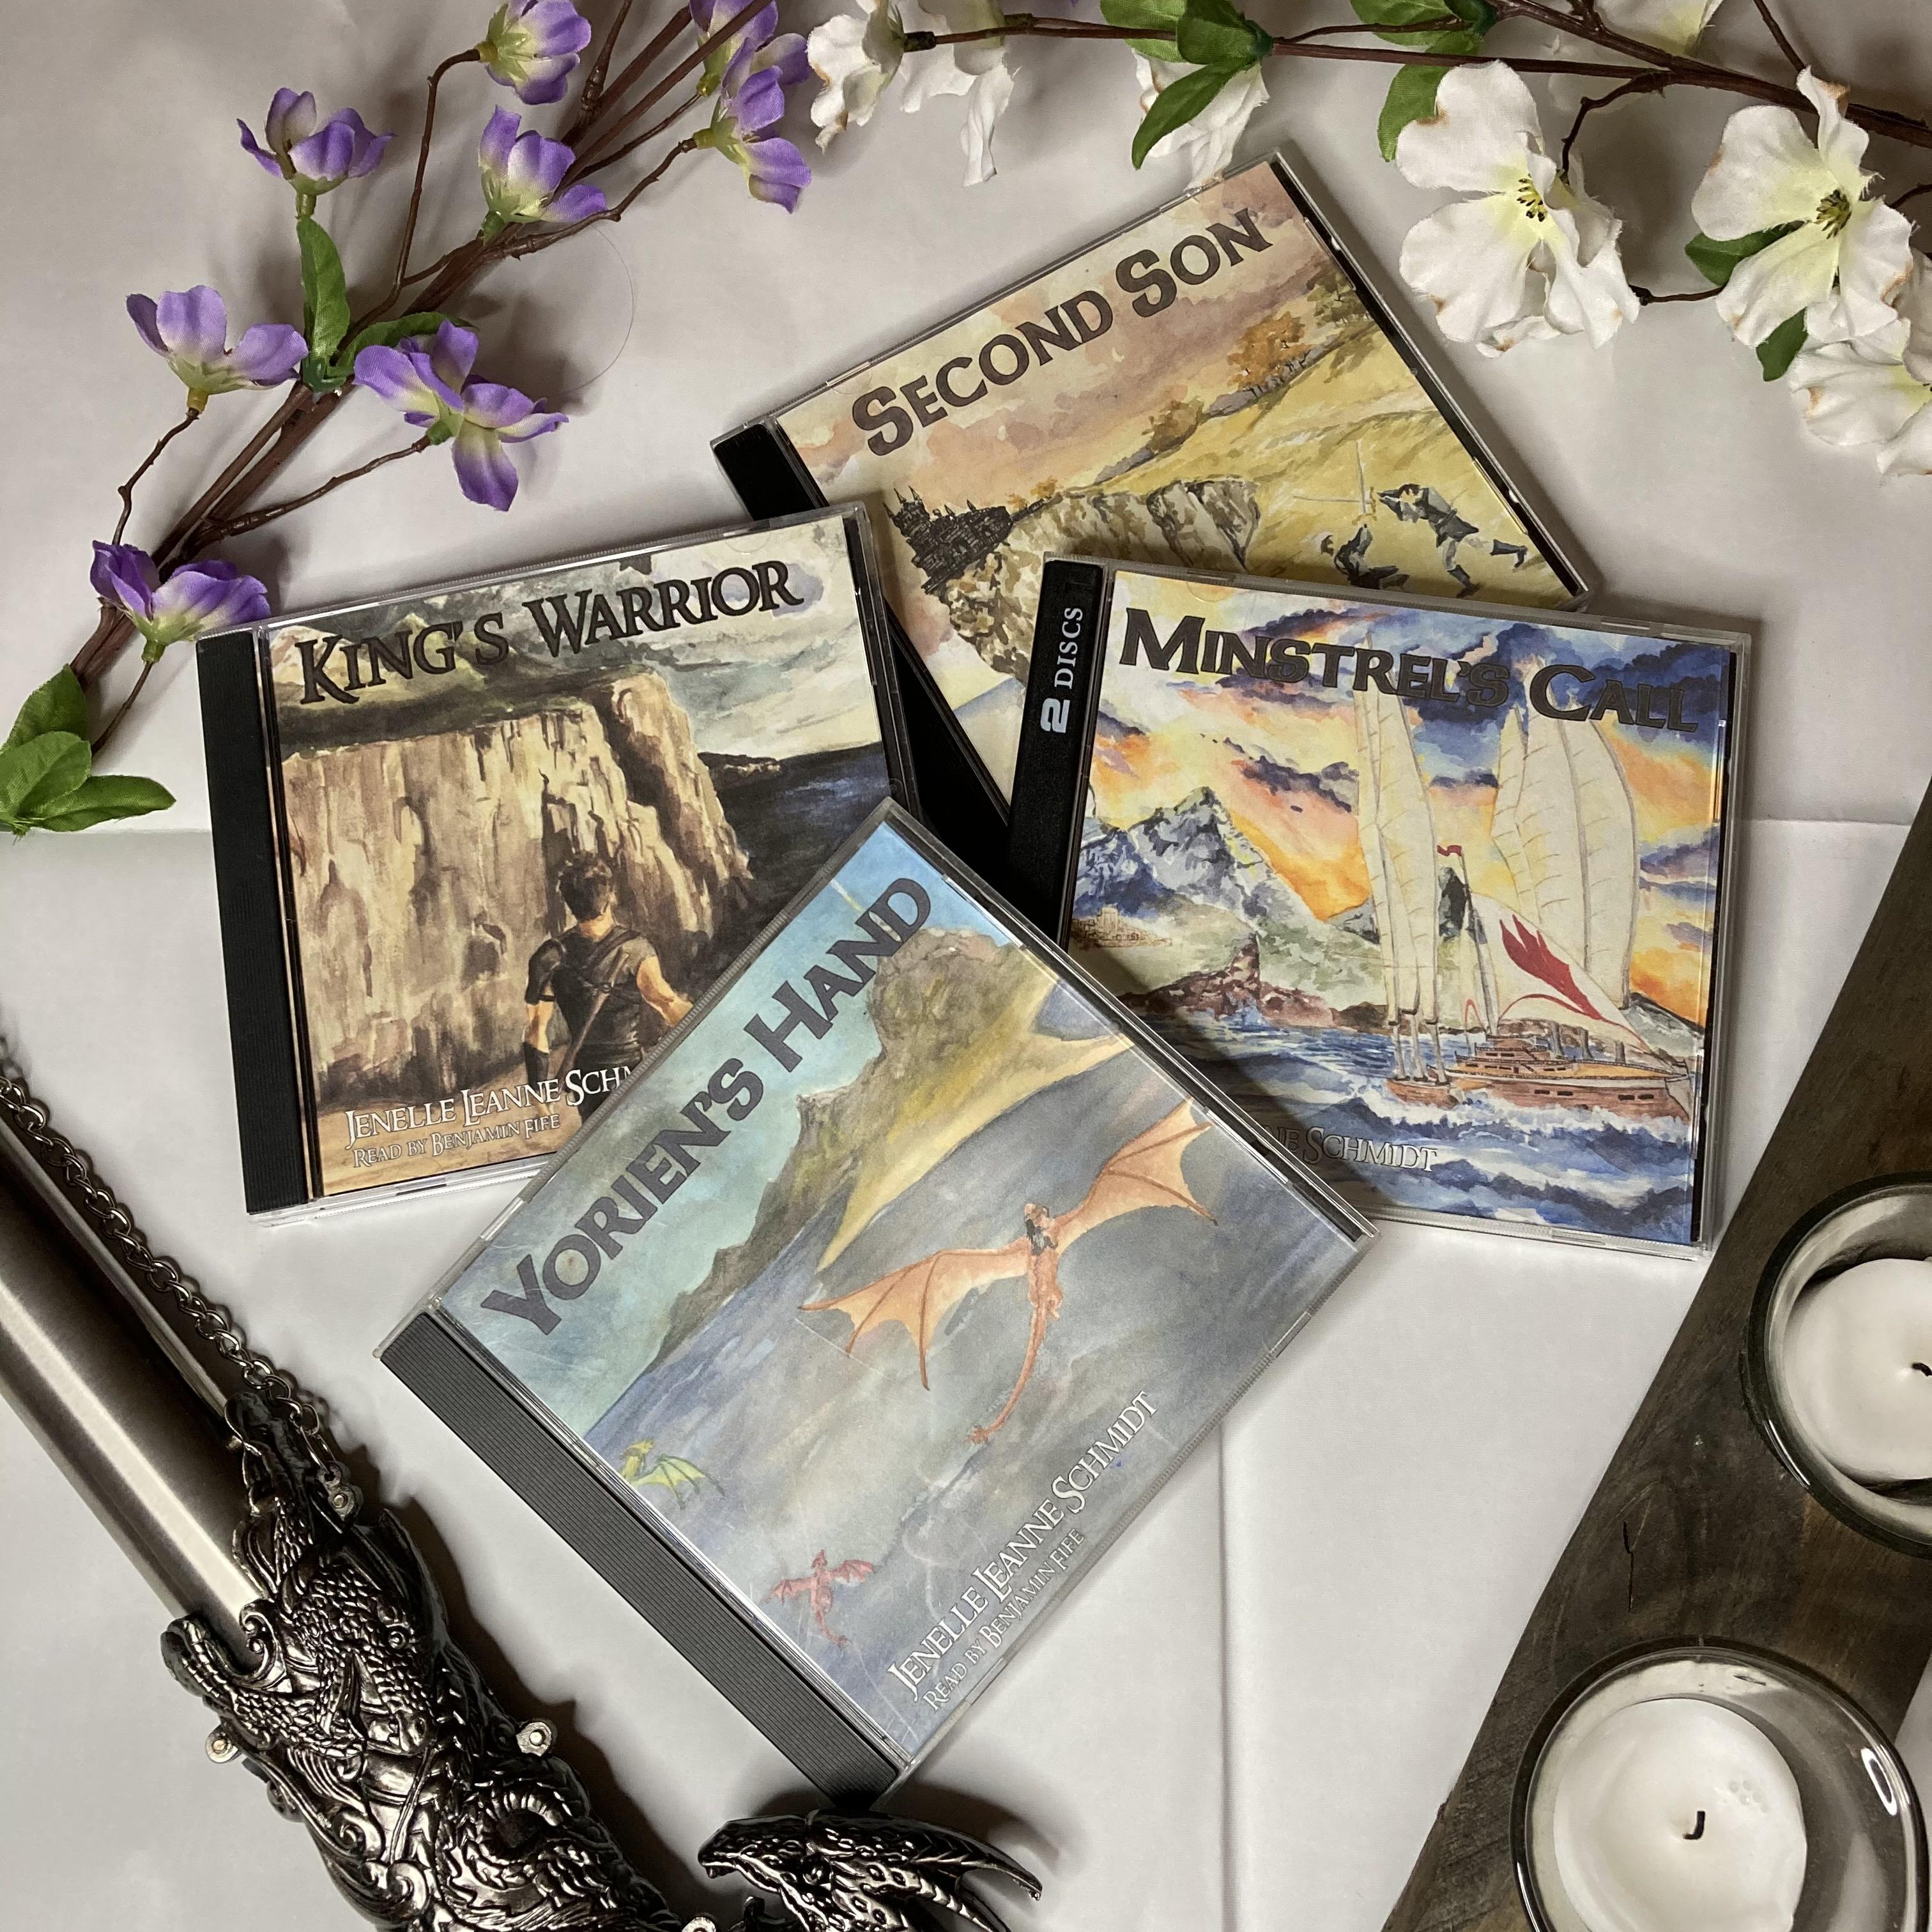 King's Warrior book, author Jenelle Schmidt, new fantasy books, fantasy adventure audio books, YA fantasy, middle grade fantasy reads, clean fantasy reads, 2020 audio books, second son book, yorien's hand book, minstrel's call book,